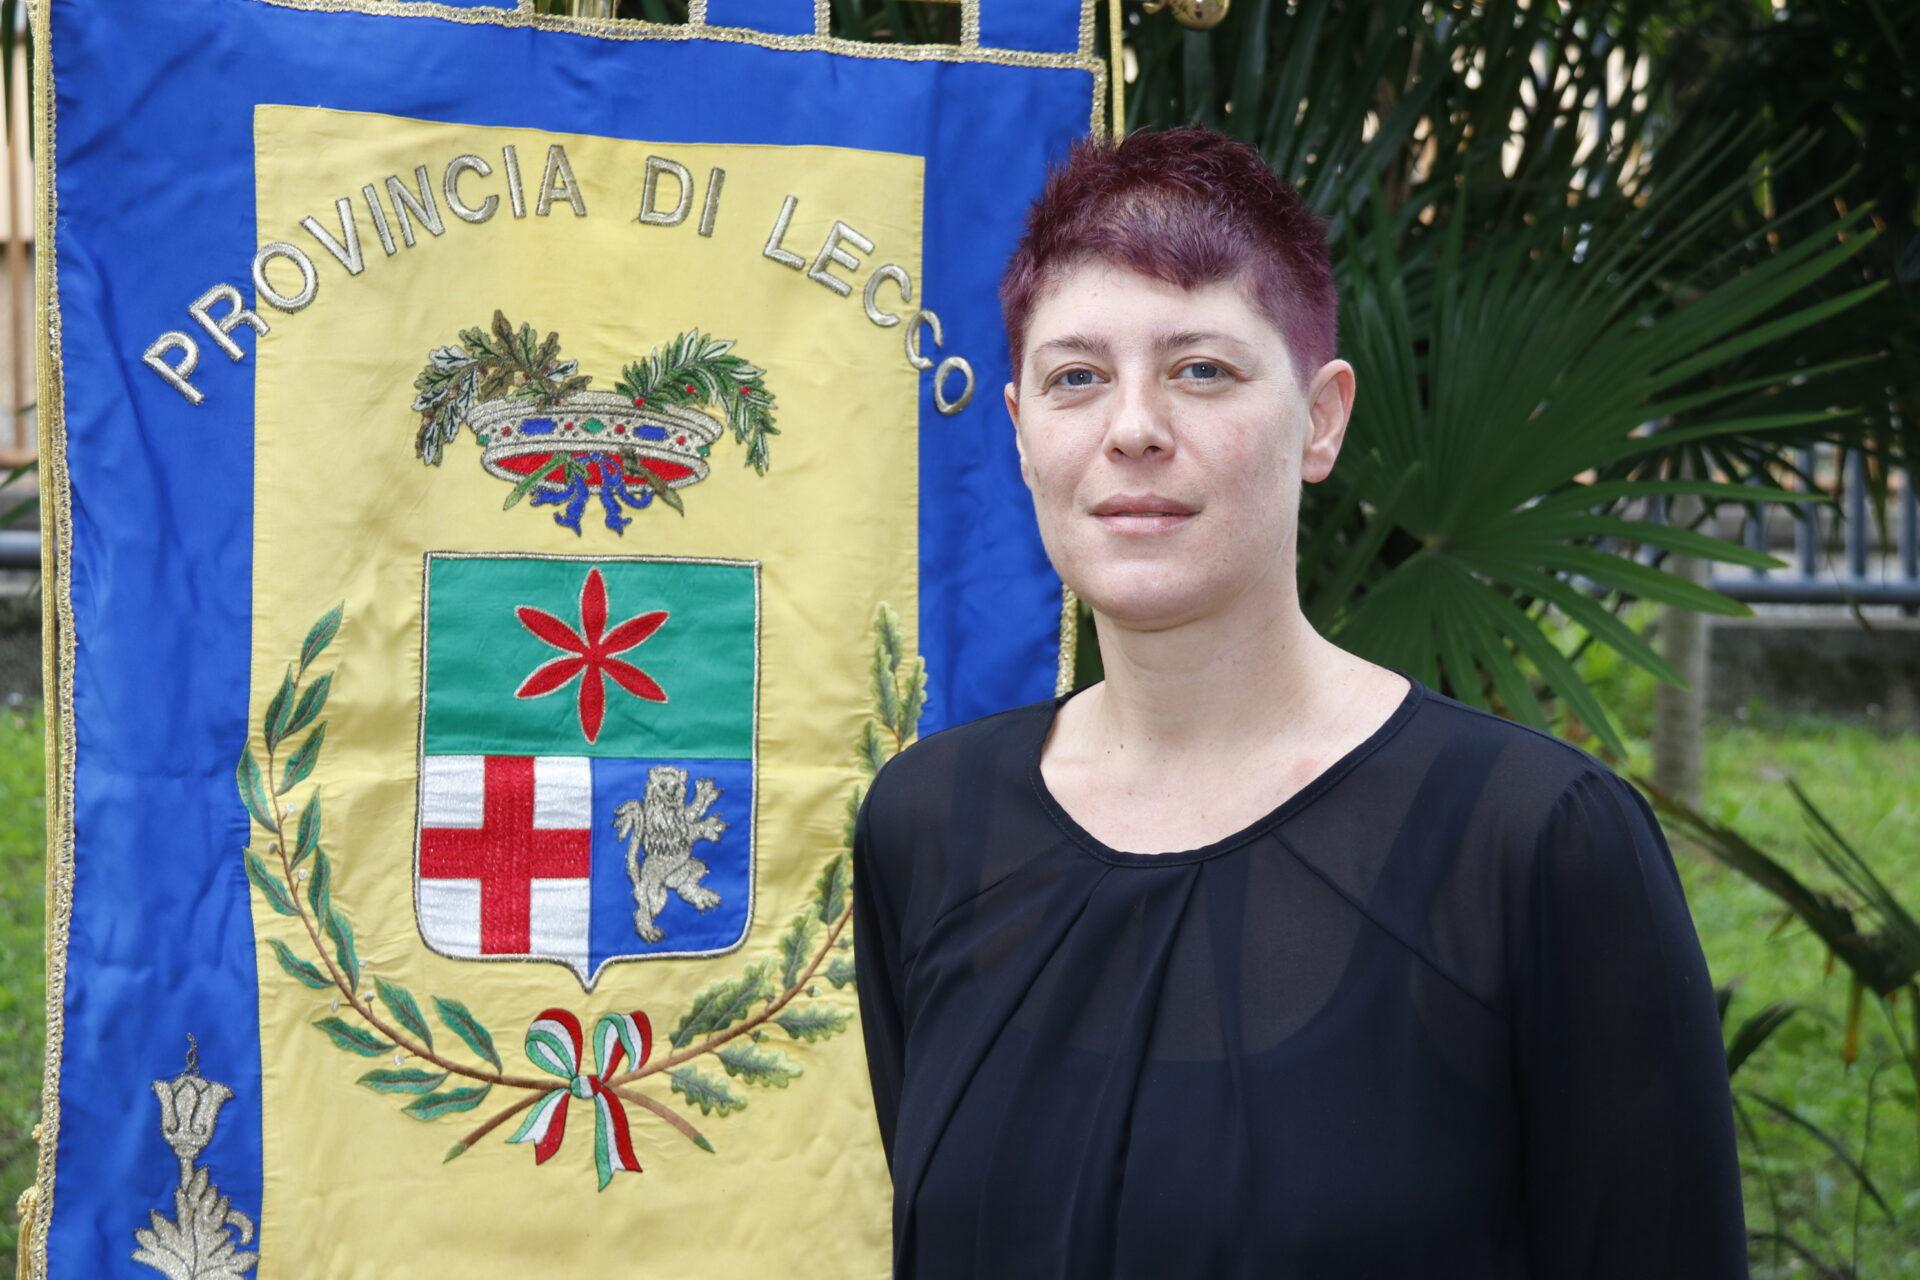 Fiorenza Albani